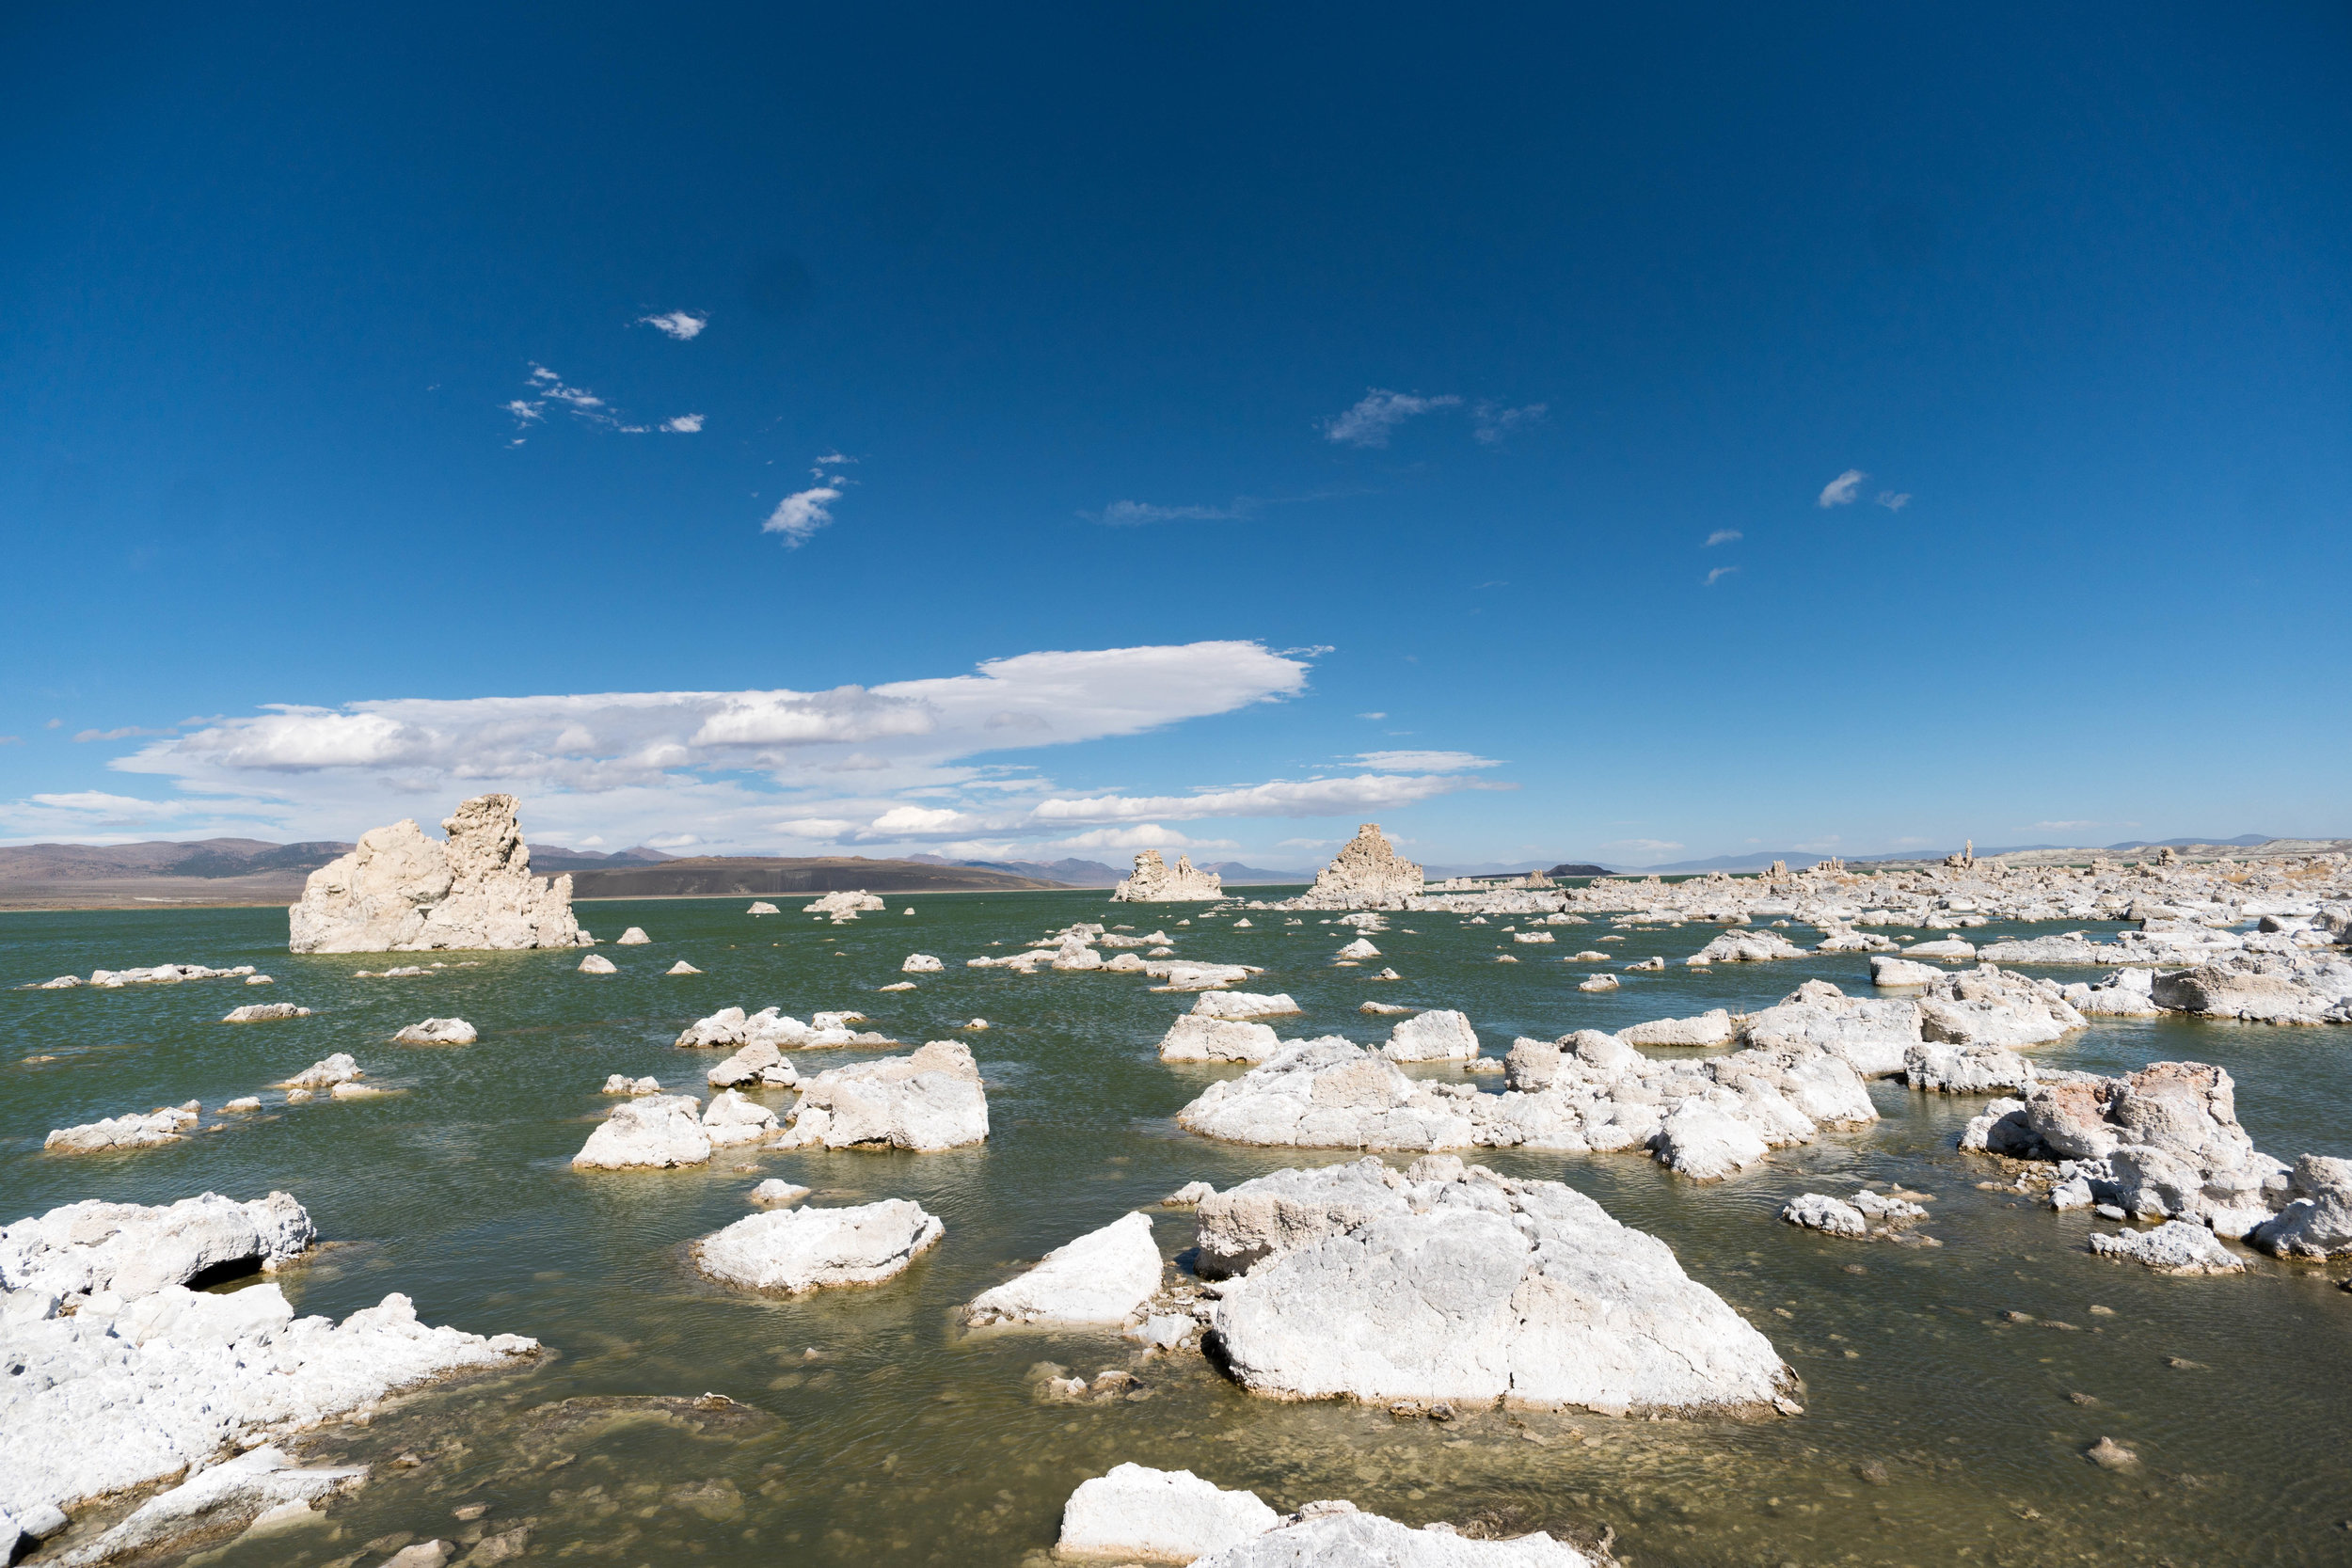 Salt towers of Mono Lake